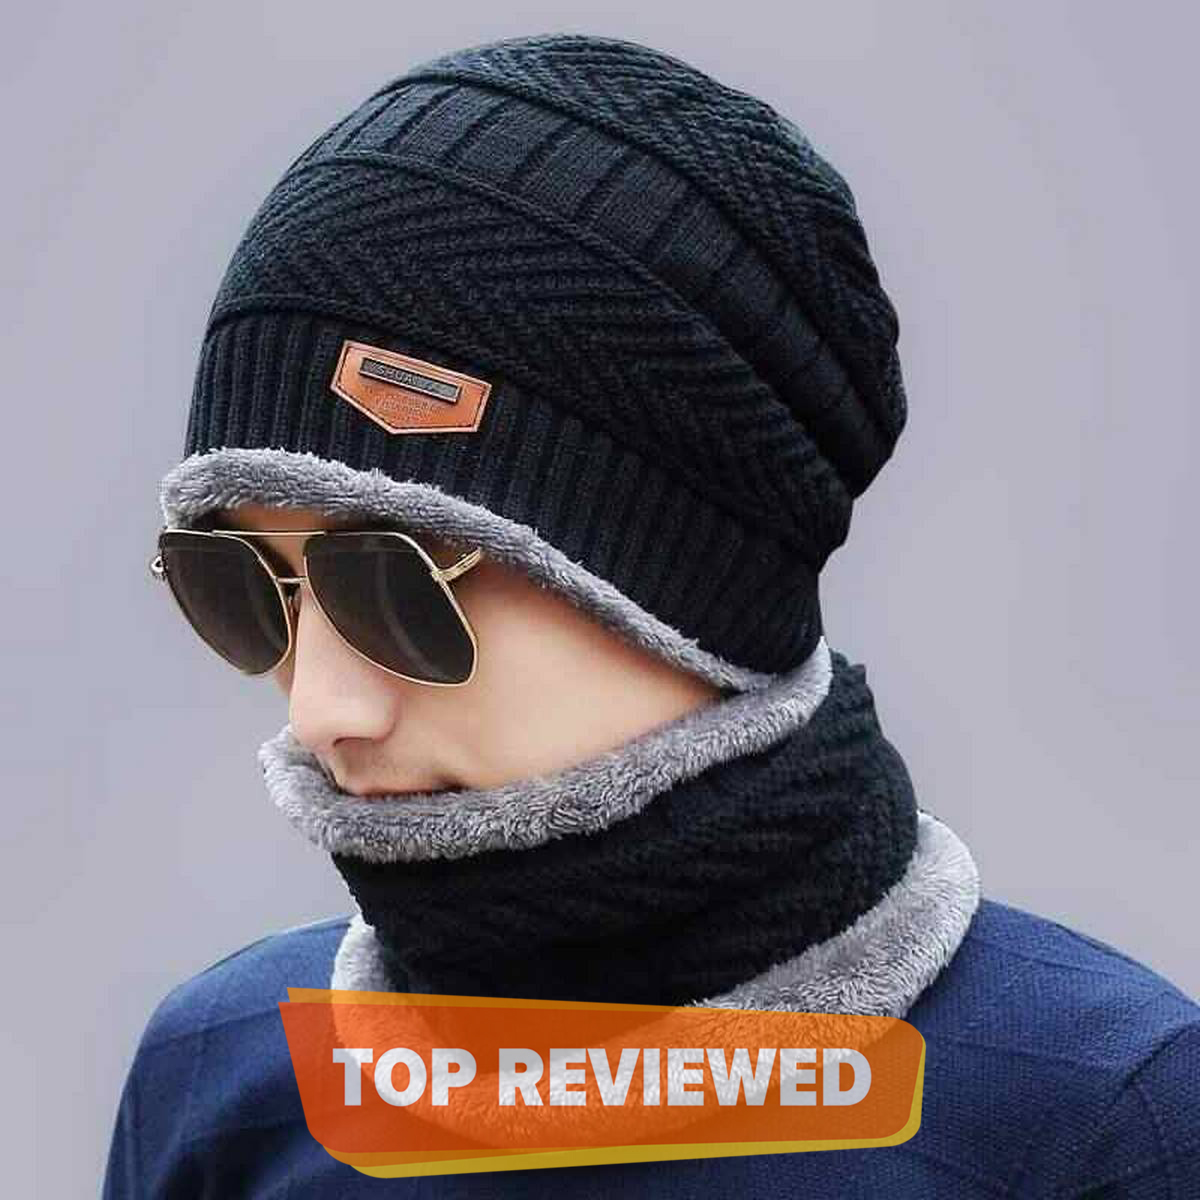 Beanies Knit Hat Winter Cap knitted Cap Thicken Hedging Cap Balaclava Skullies Fashion Warm knit Beanie for Men/Women